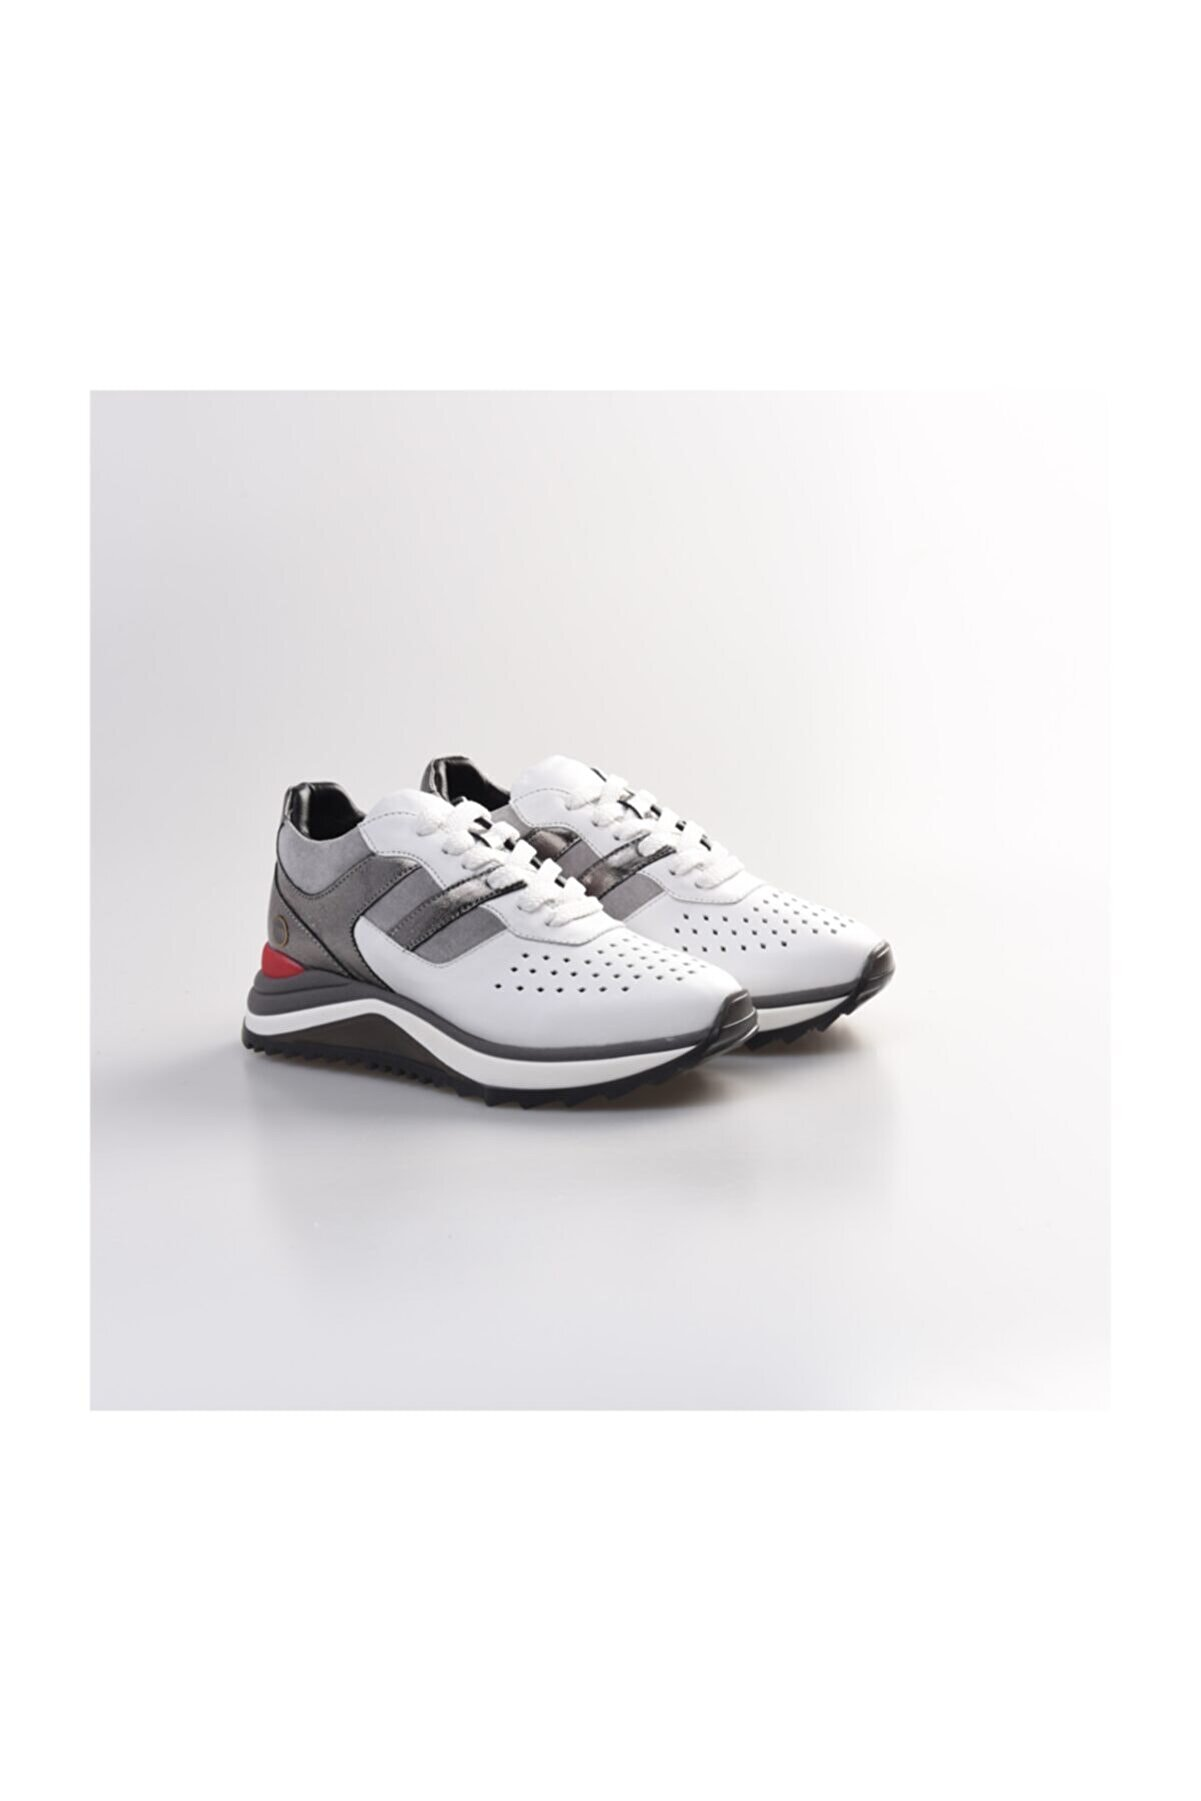 Mammamia Deri Spor Ayakkabı D20ya-3970